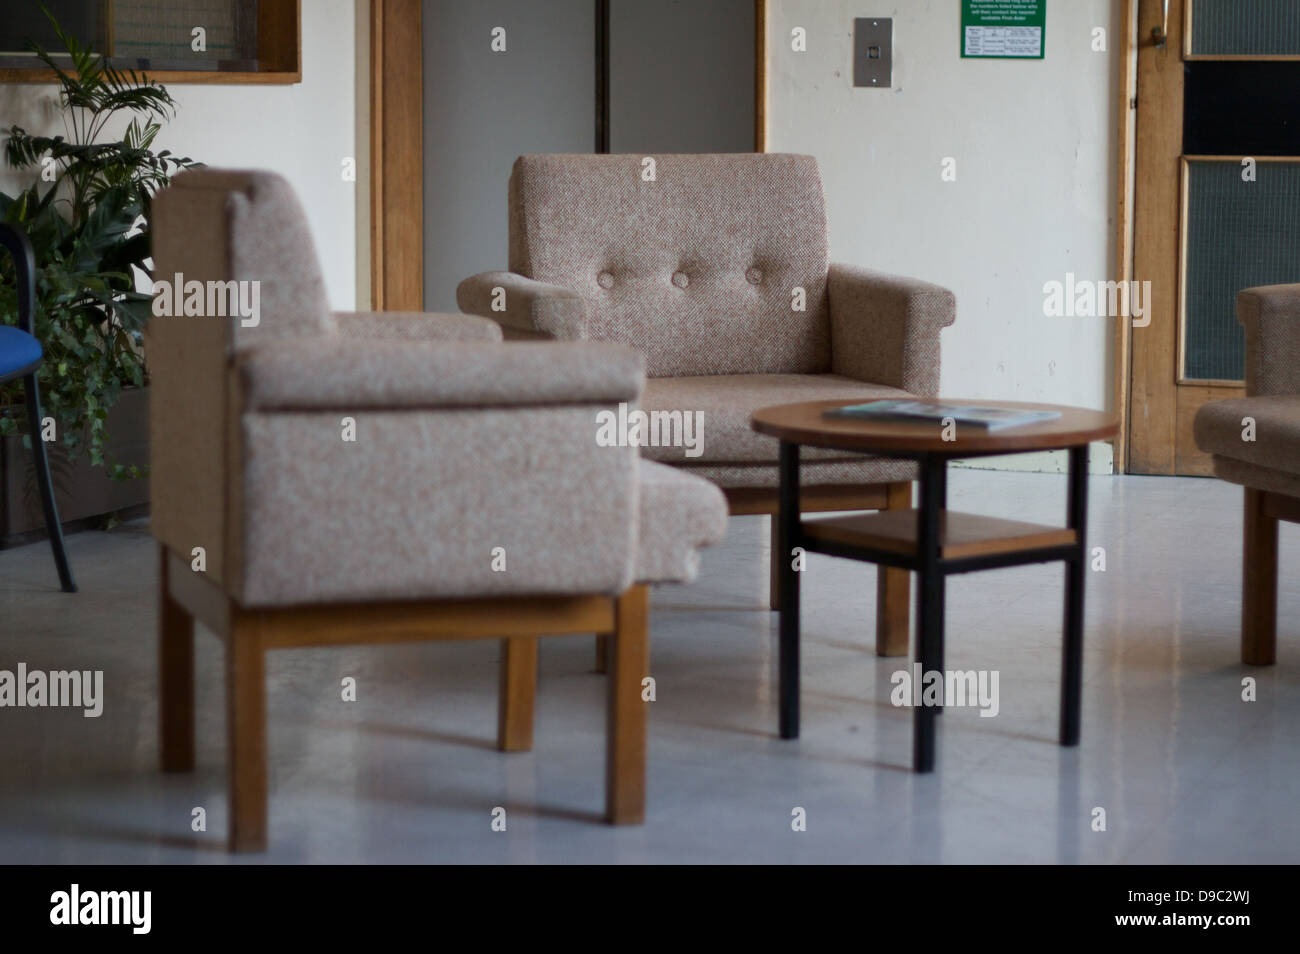 Retro Chairs Stockfotos & Retro Chairs Bilder - Alamy